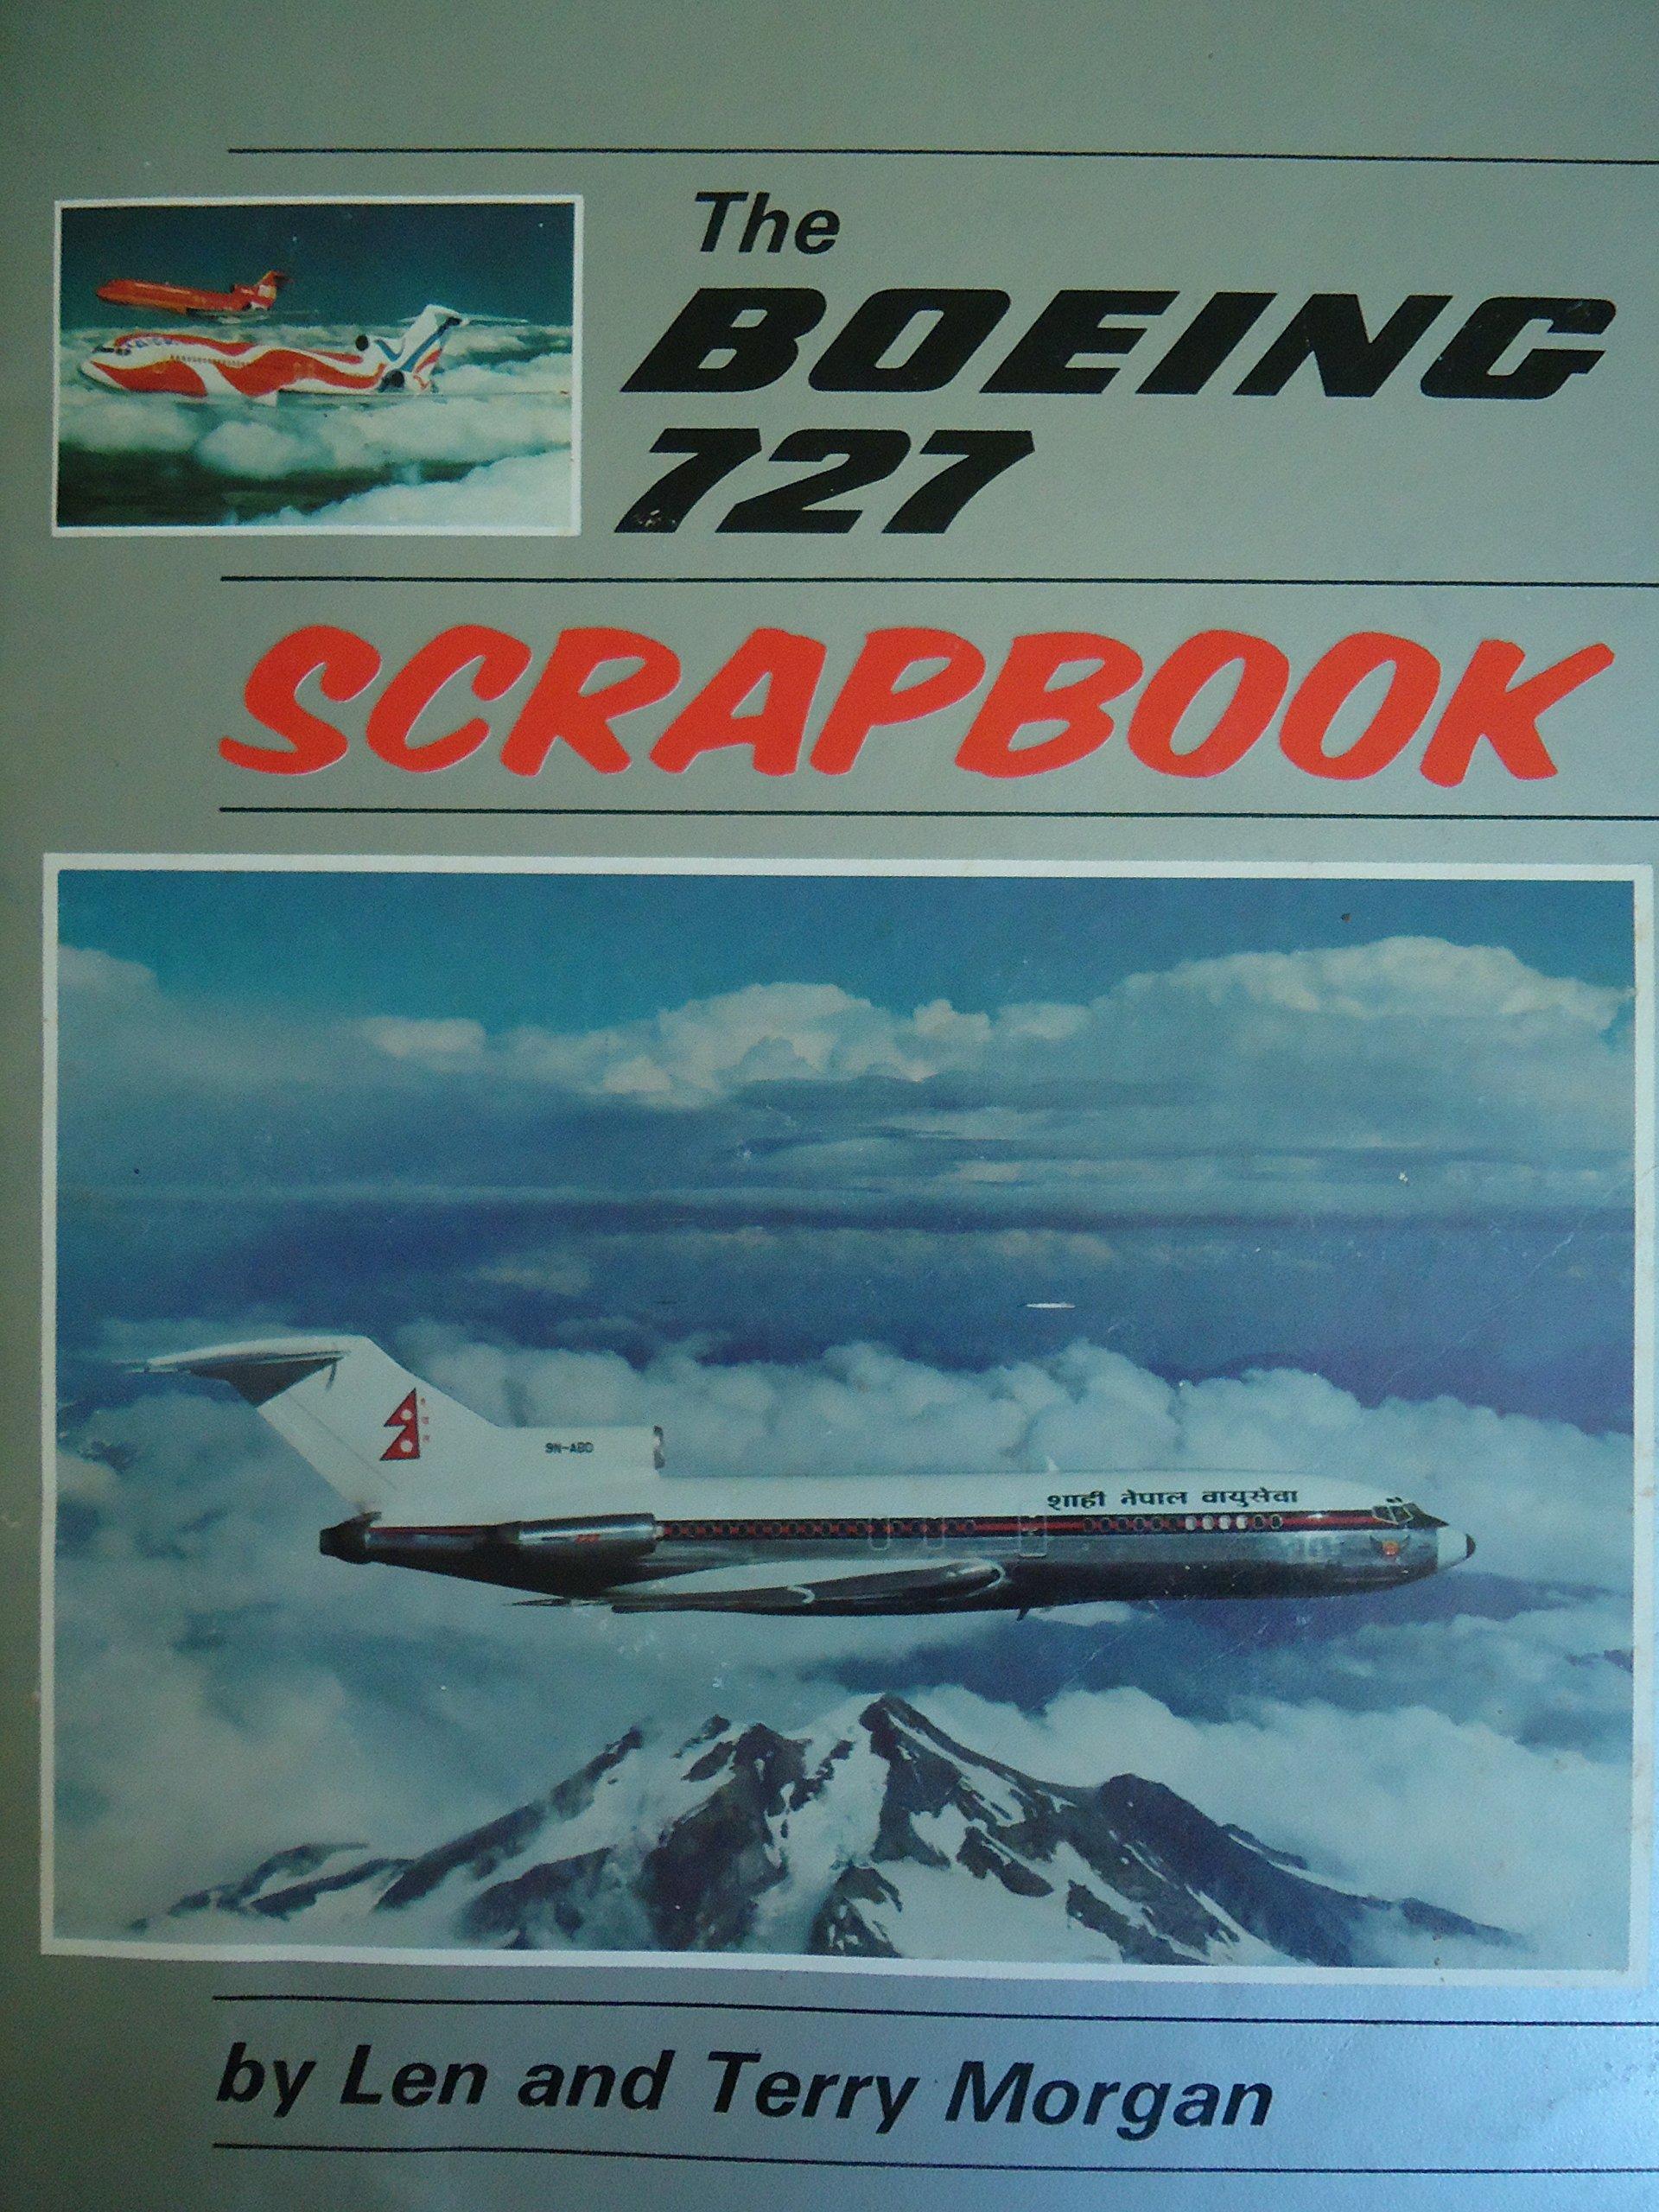 boeing 727 scrapbook len morgan and terry morgan 9780816883493 rh amazon com Boeing 797 Boeing 747